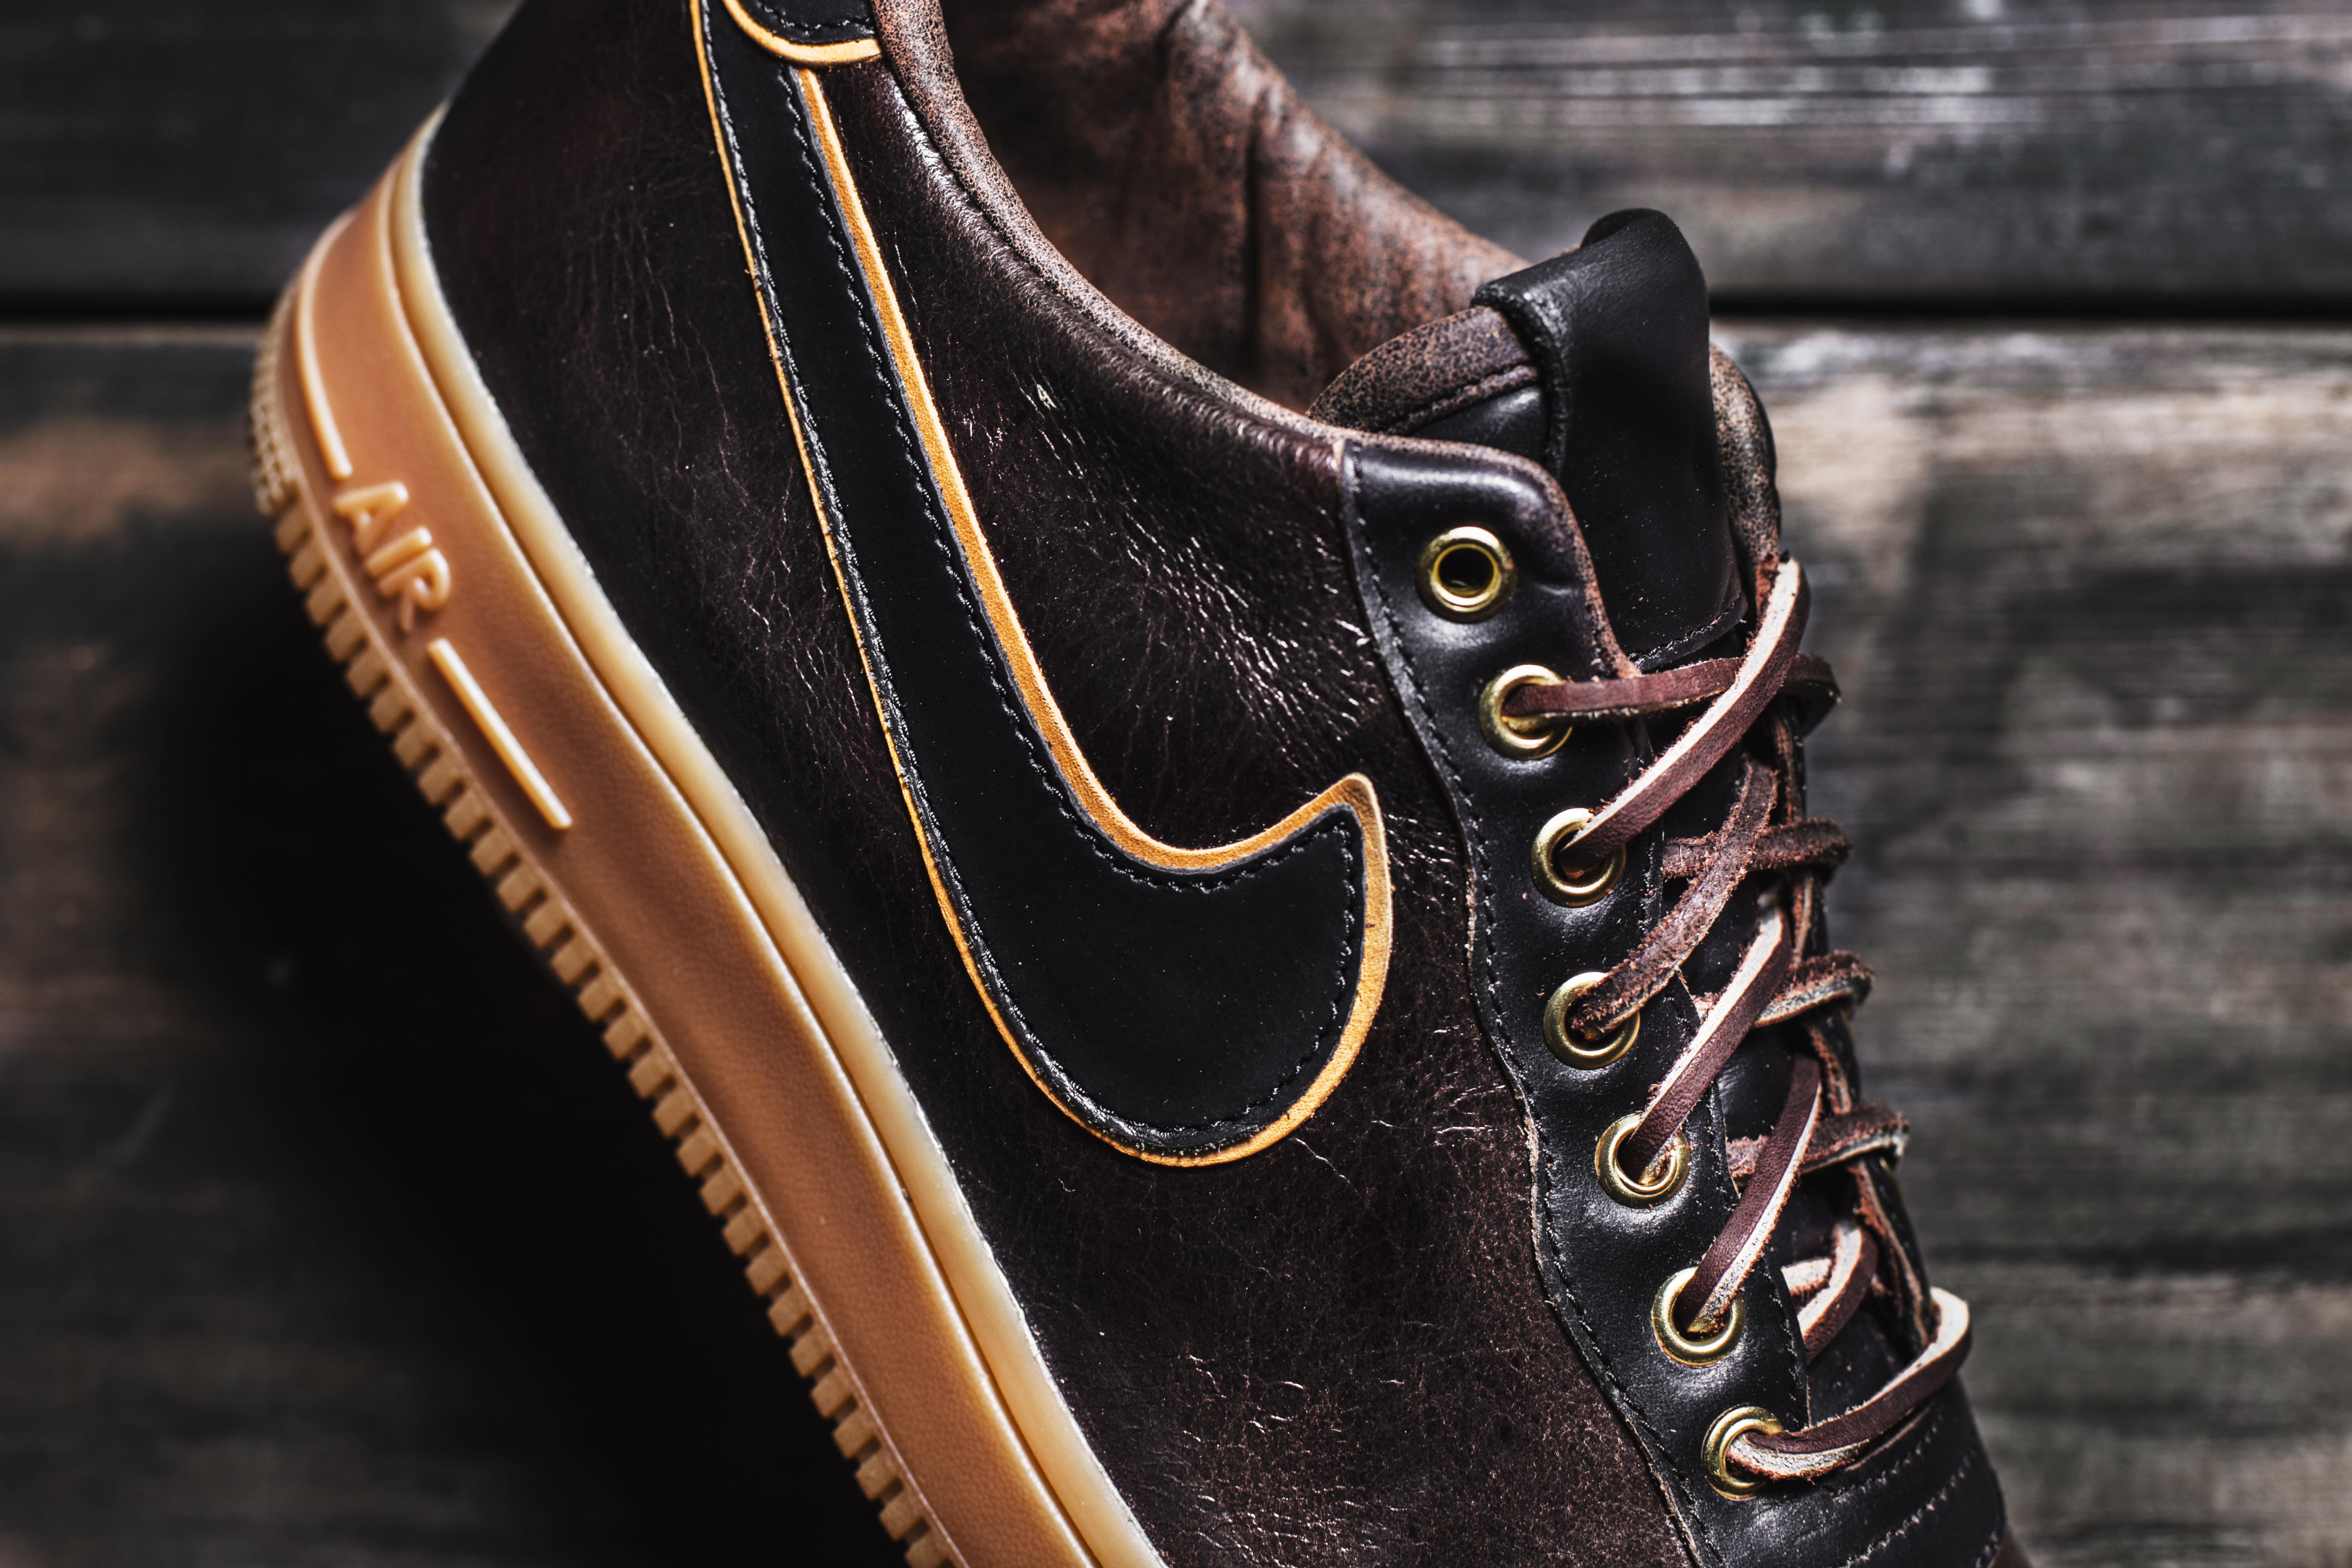 Jack Daniels x The Shoe Surgeon x Nike Air Force 1 2